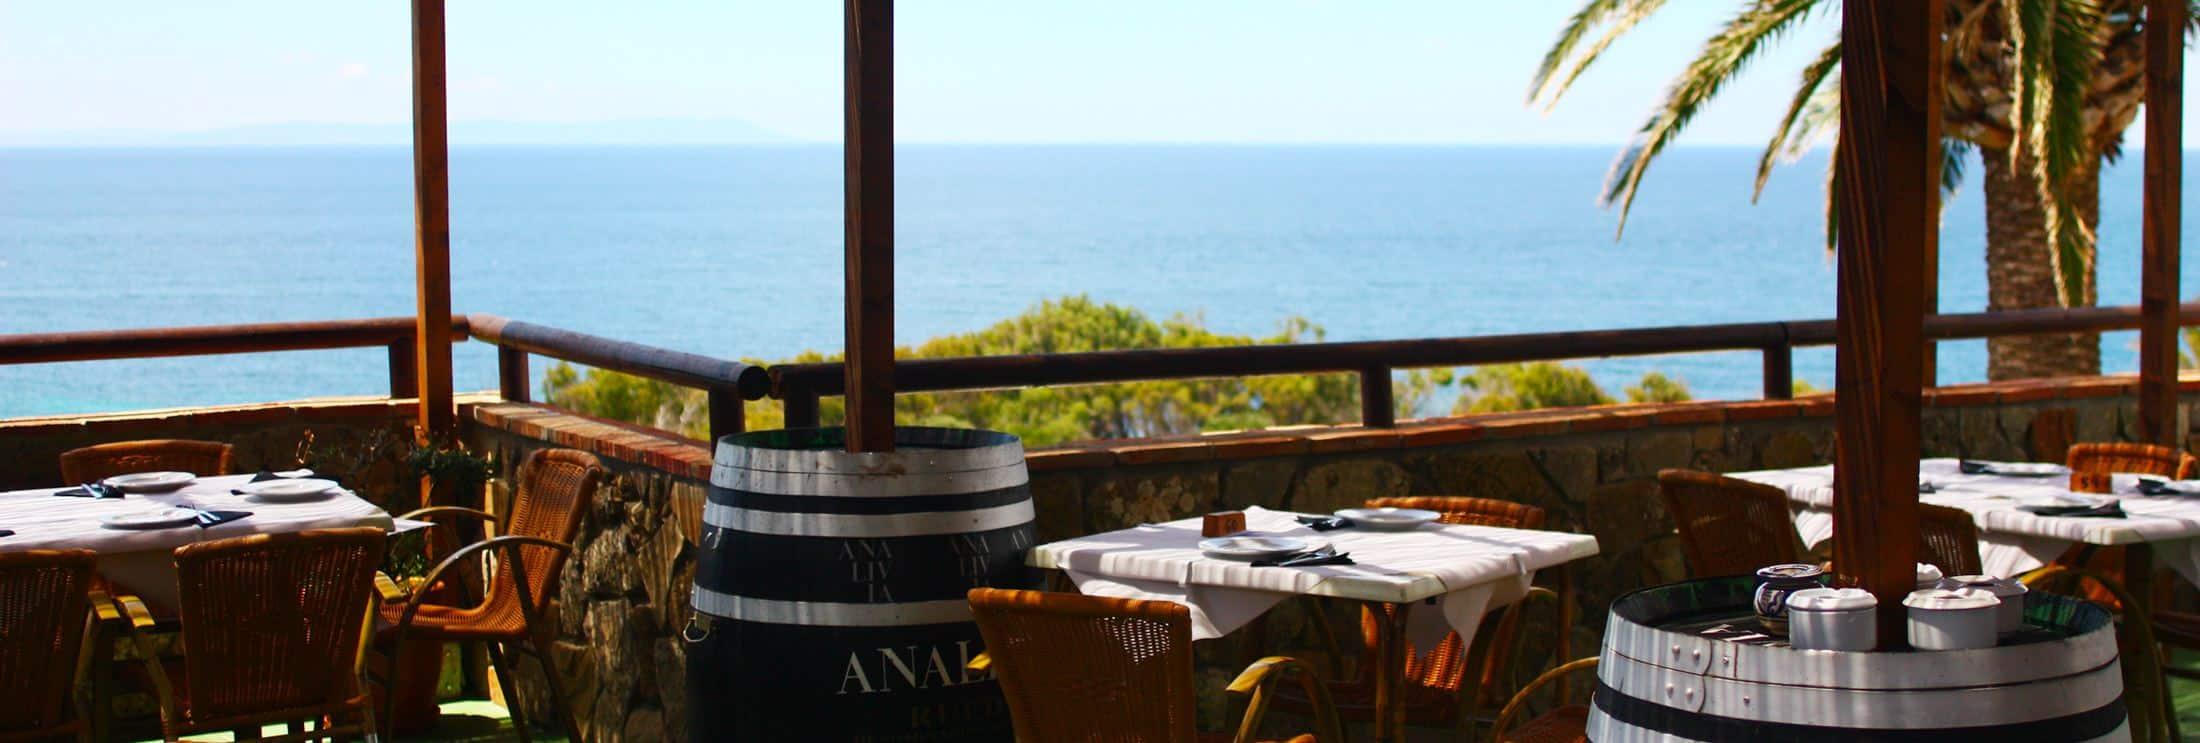 El-Mirlo-Spanish Restaurante-tarifa-Seafood-Punta-Paloma